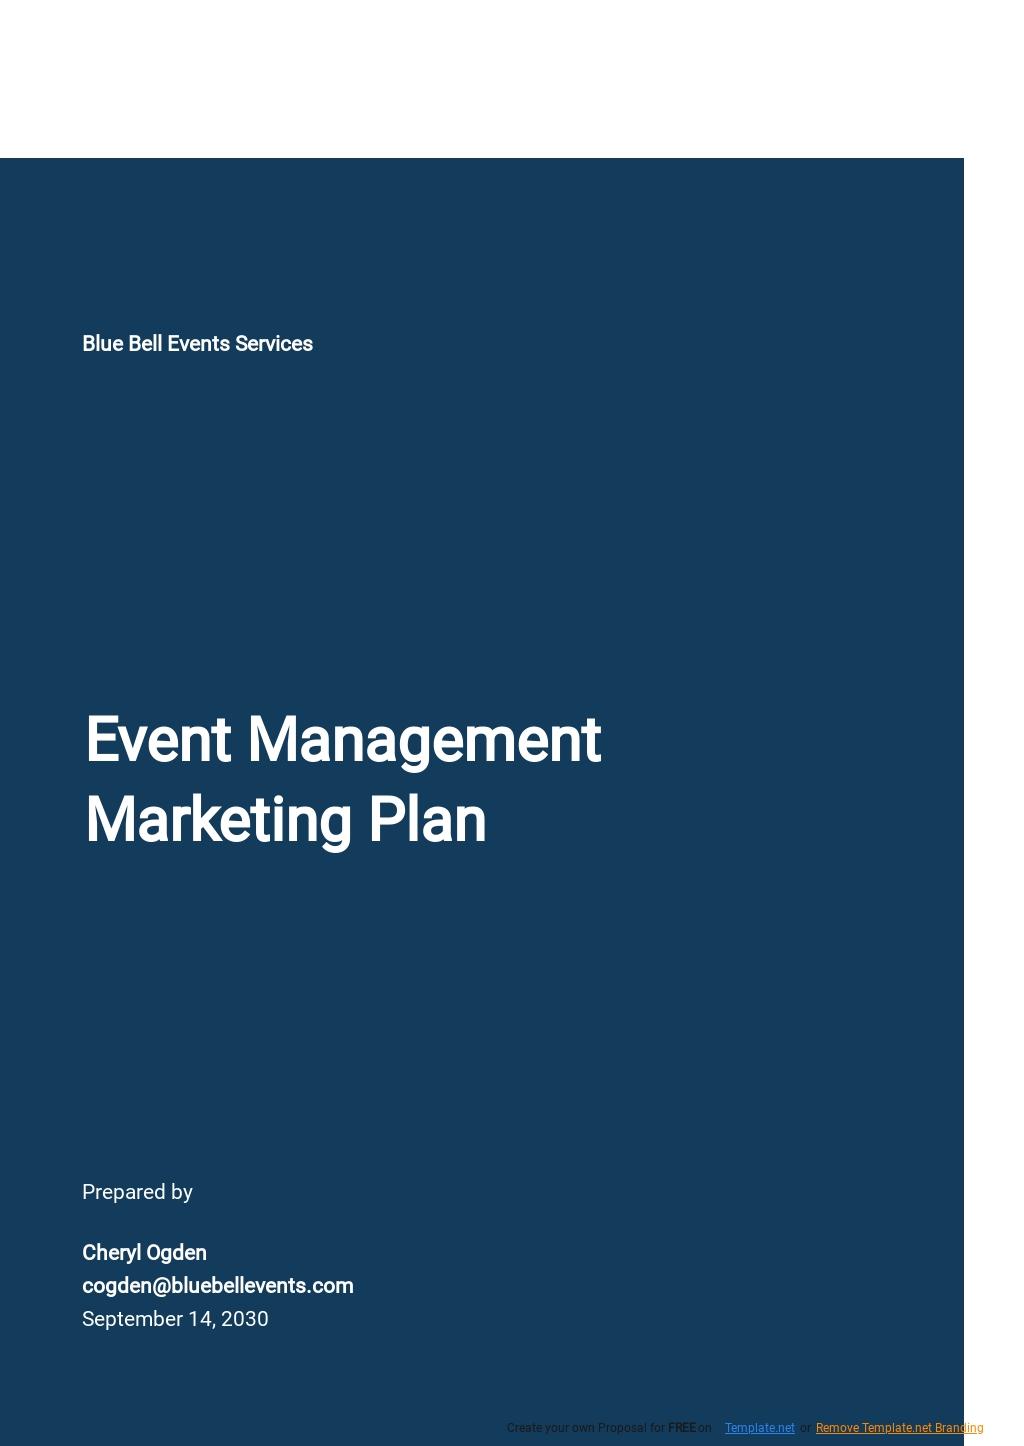 Event Management Marketing Plan Template